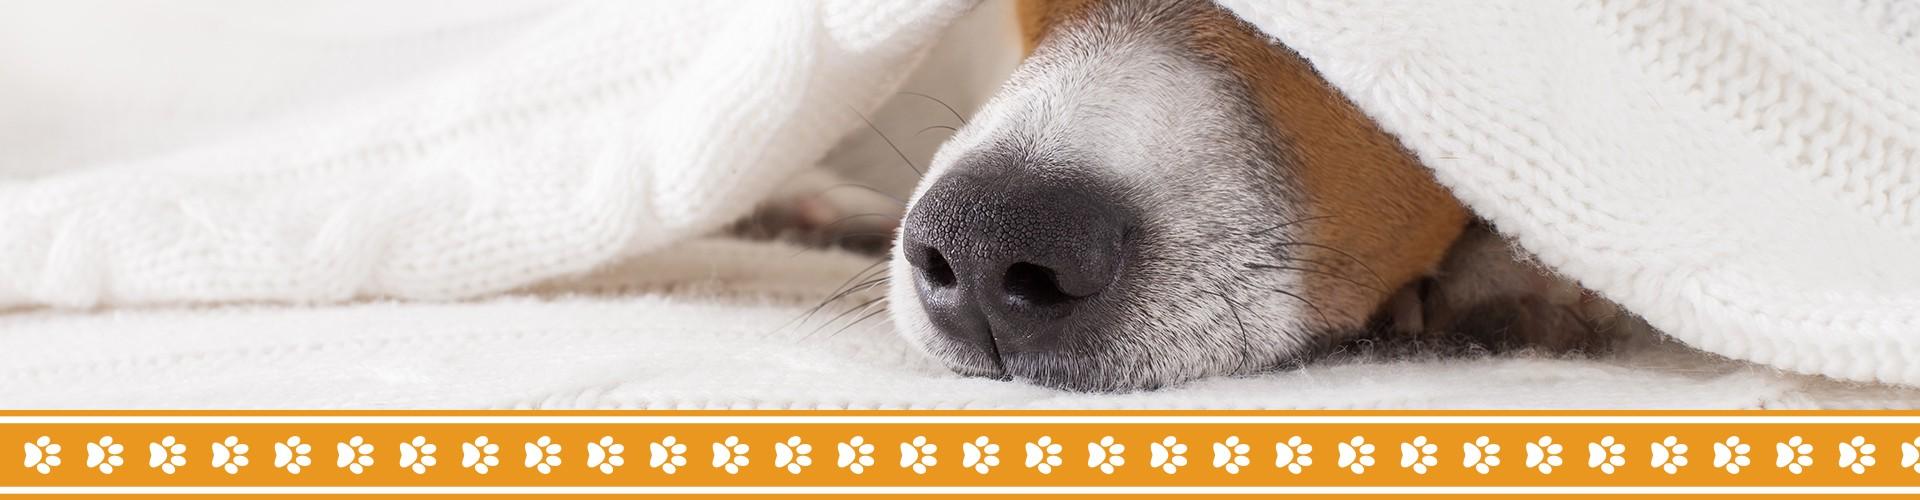 Dog hiding under the blankets